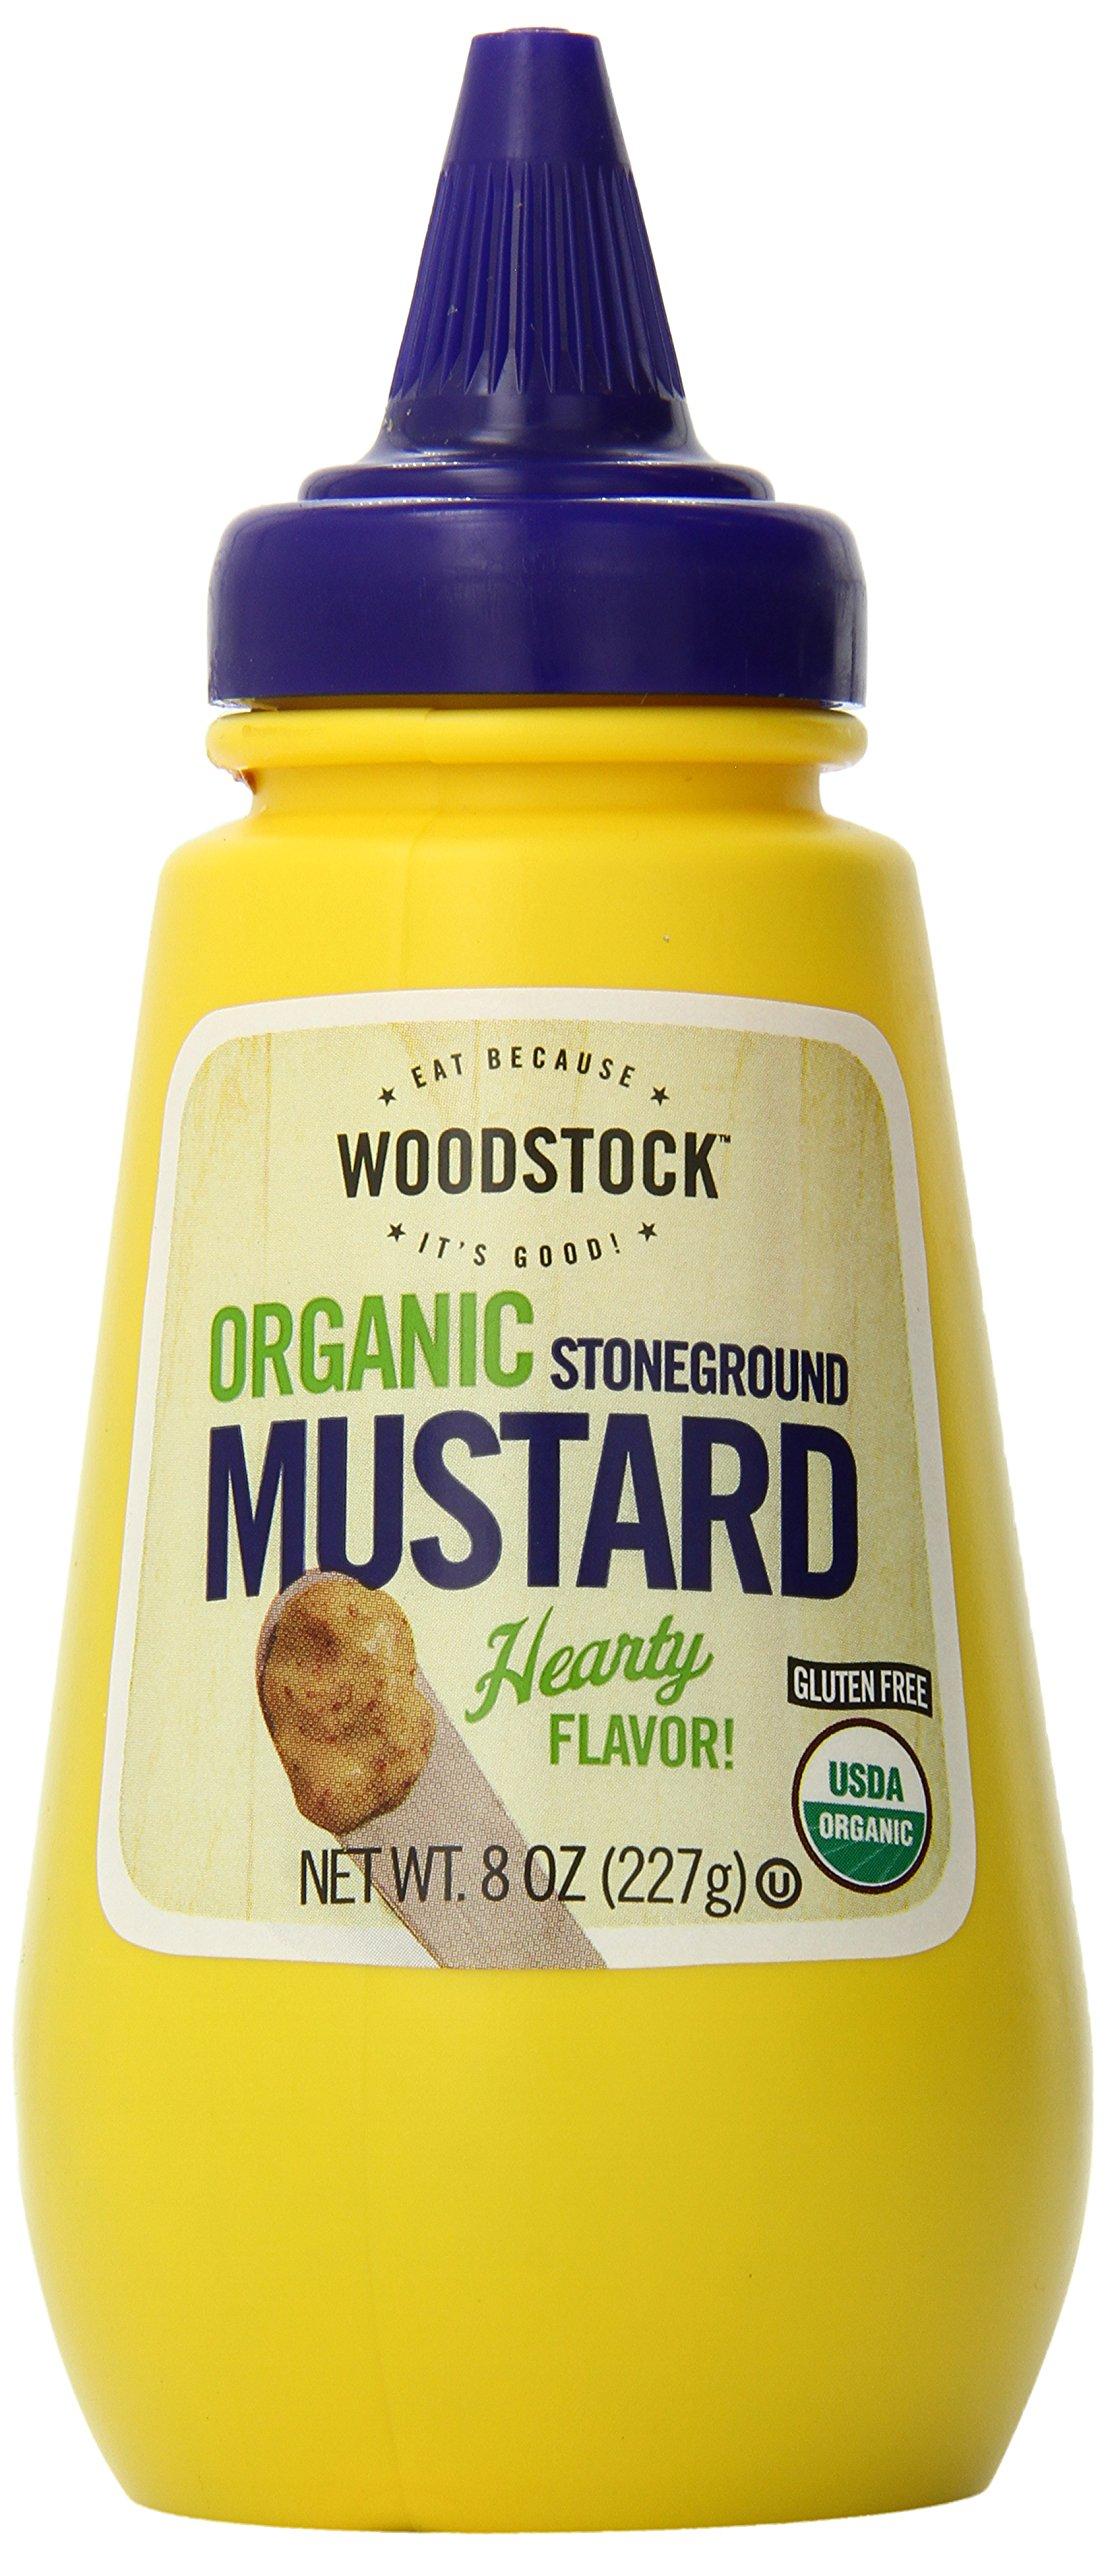 Woodstock Organic Stoneground Mustard, 8 Ounce (Pack of 12)